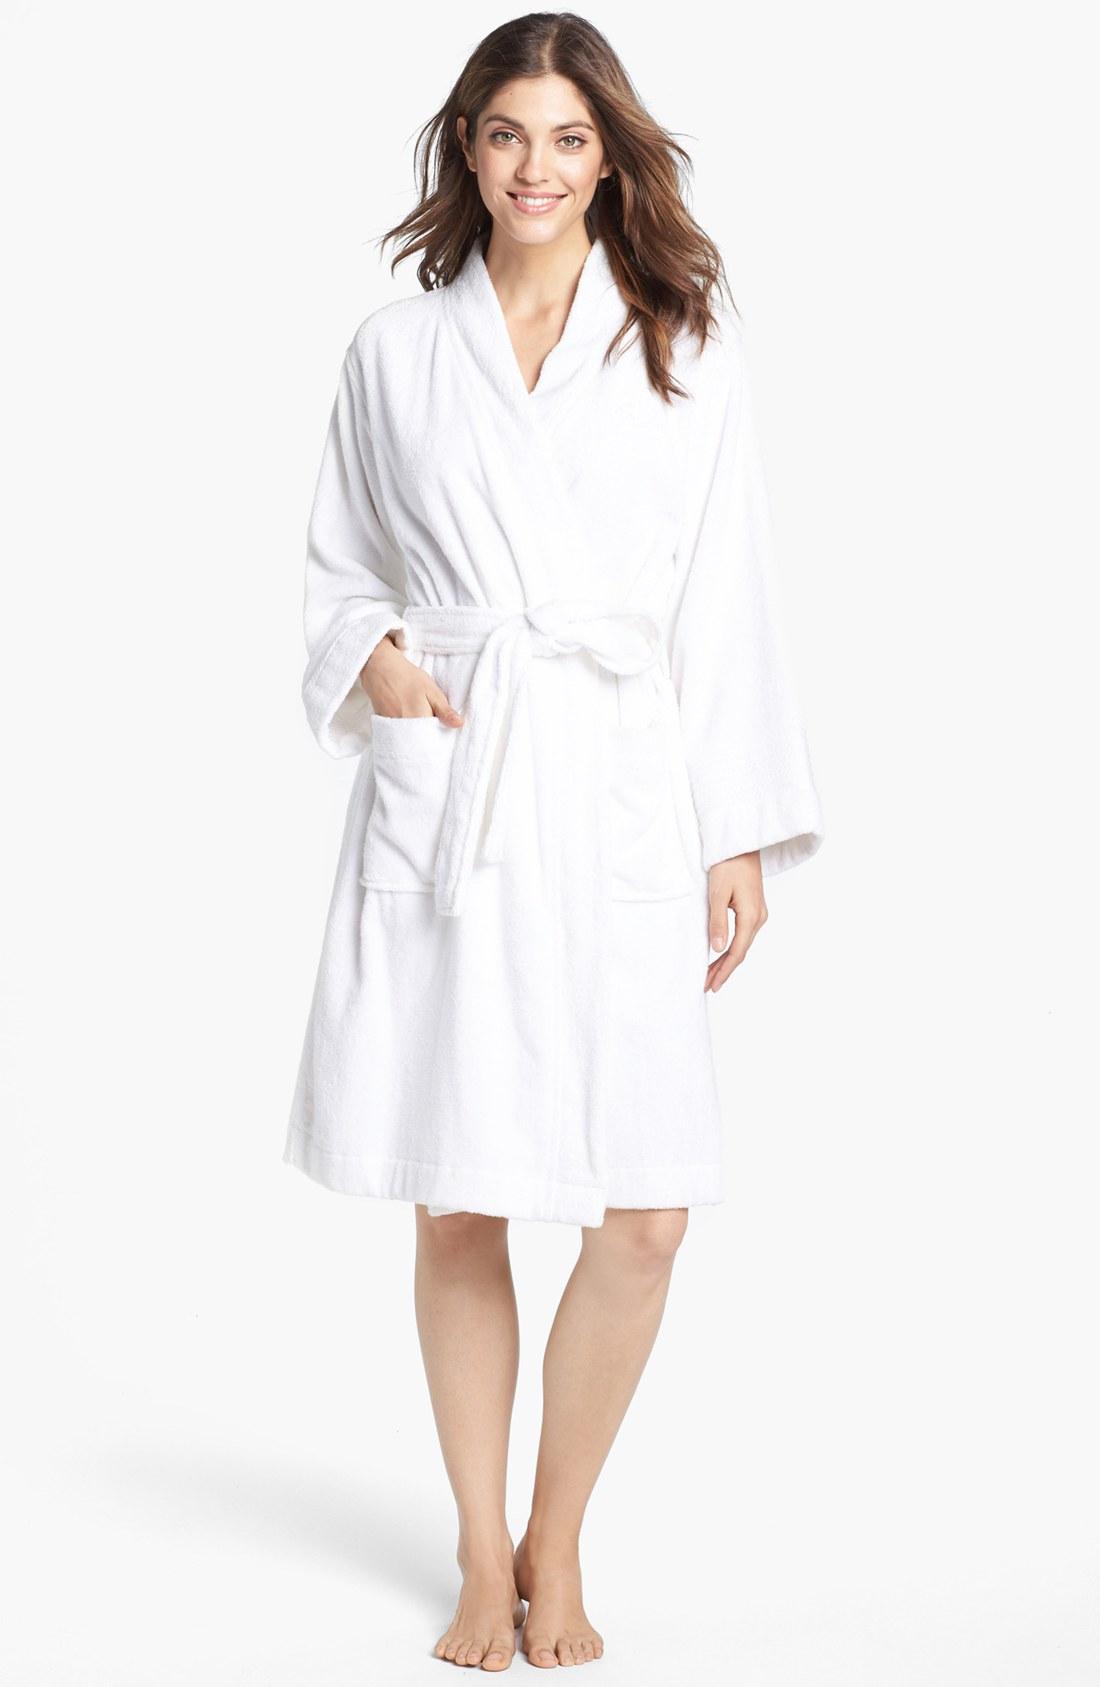 lauren by ralph lauren cotton terry robe in white lyst. Black Bedroom Furniture Sets. Home Design Ideas